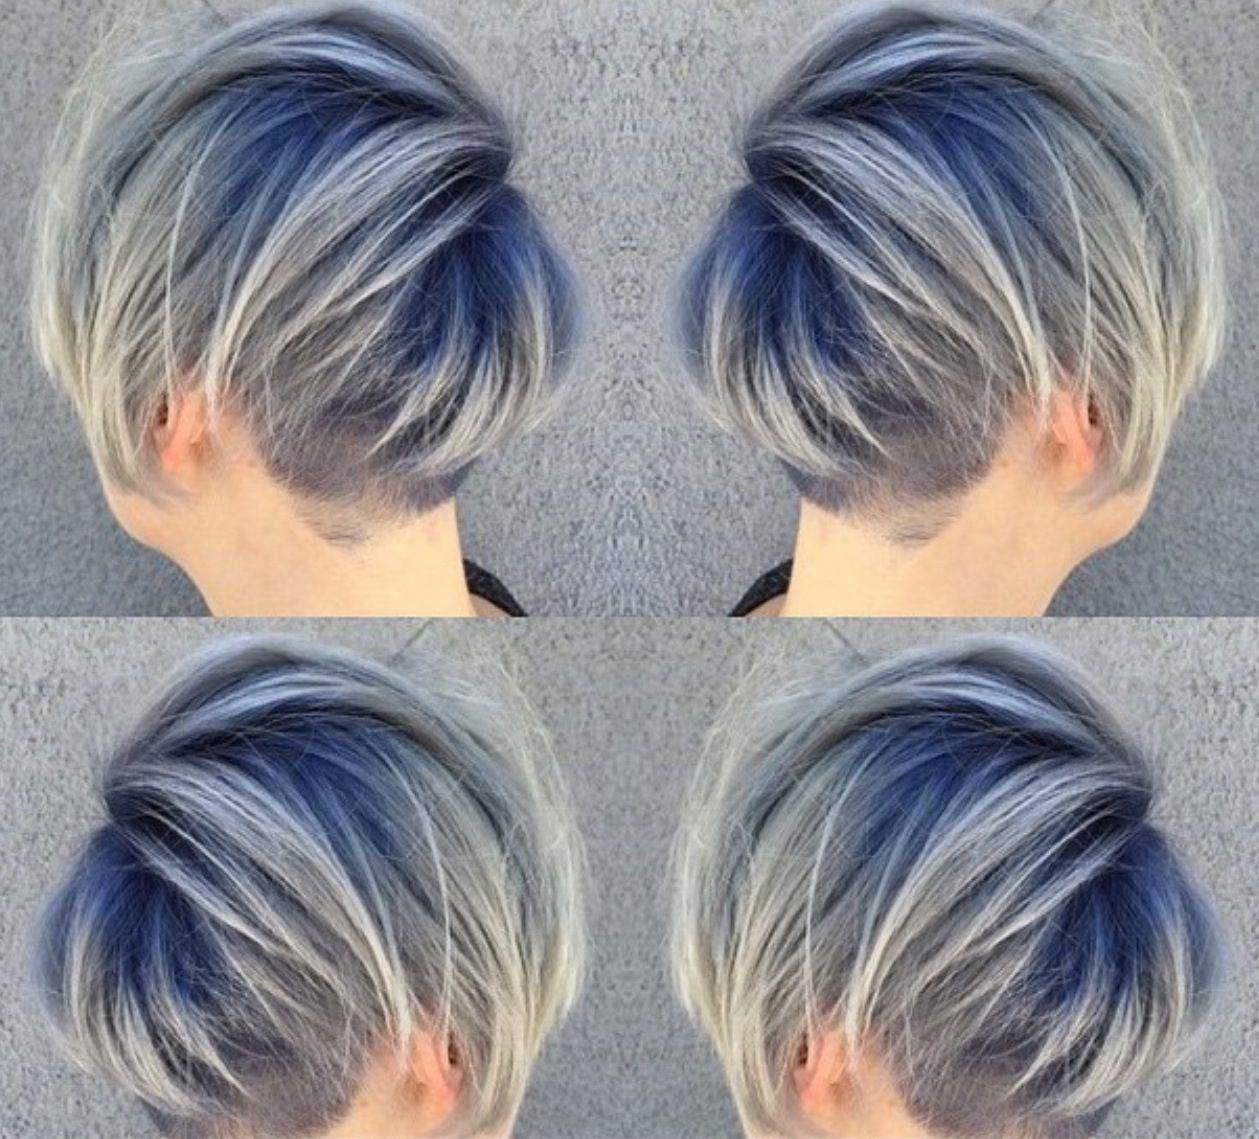 25 Cute Balayage Styles For Short Hair Popular Haircuts Short Hair Balayage Short Ombre Hair Balayage Hair